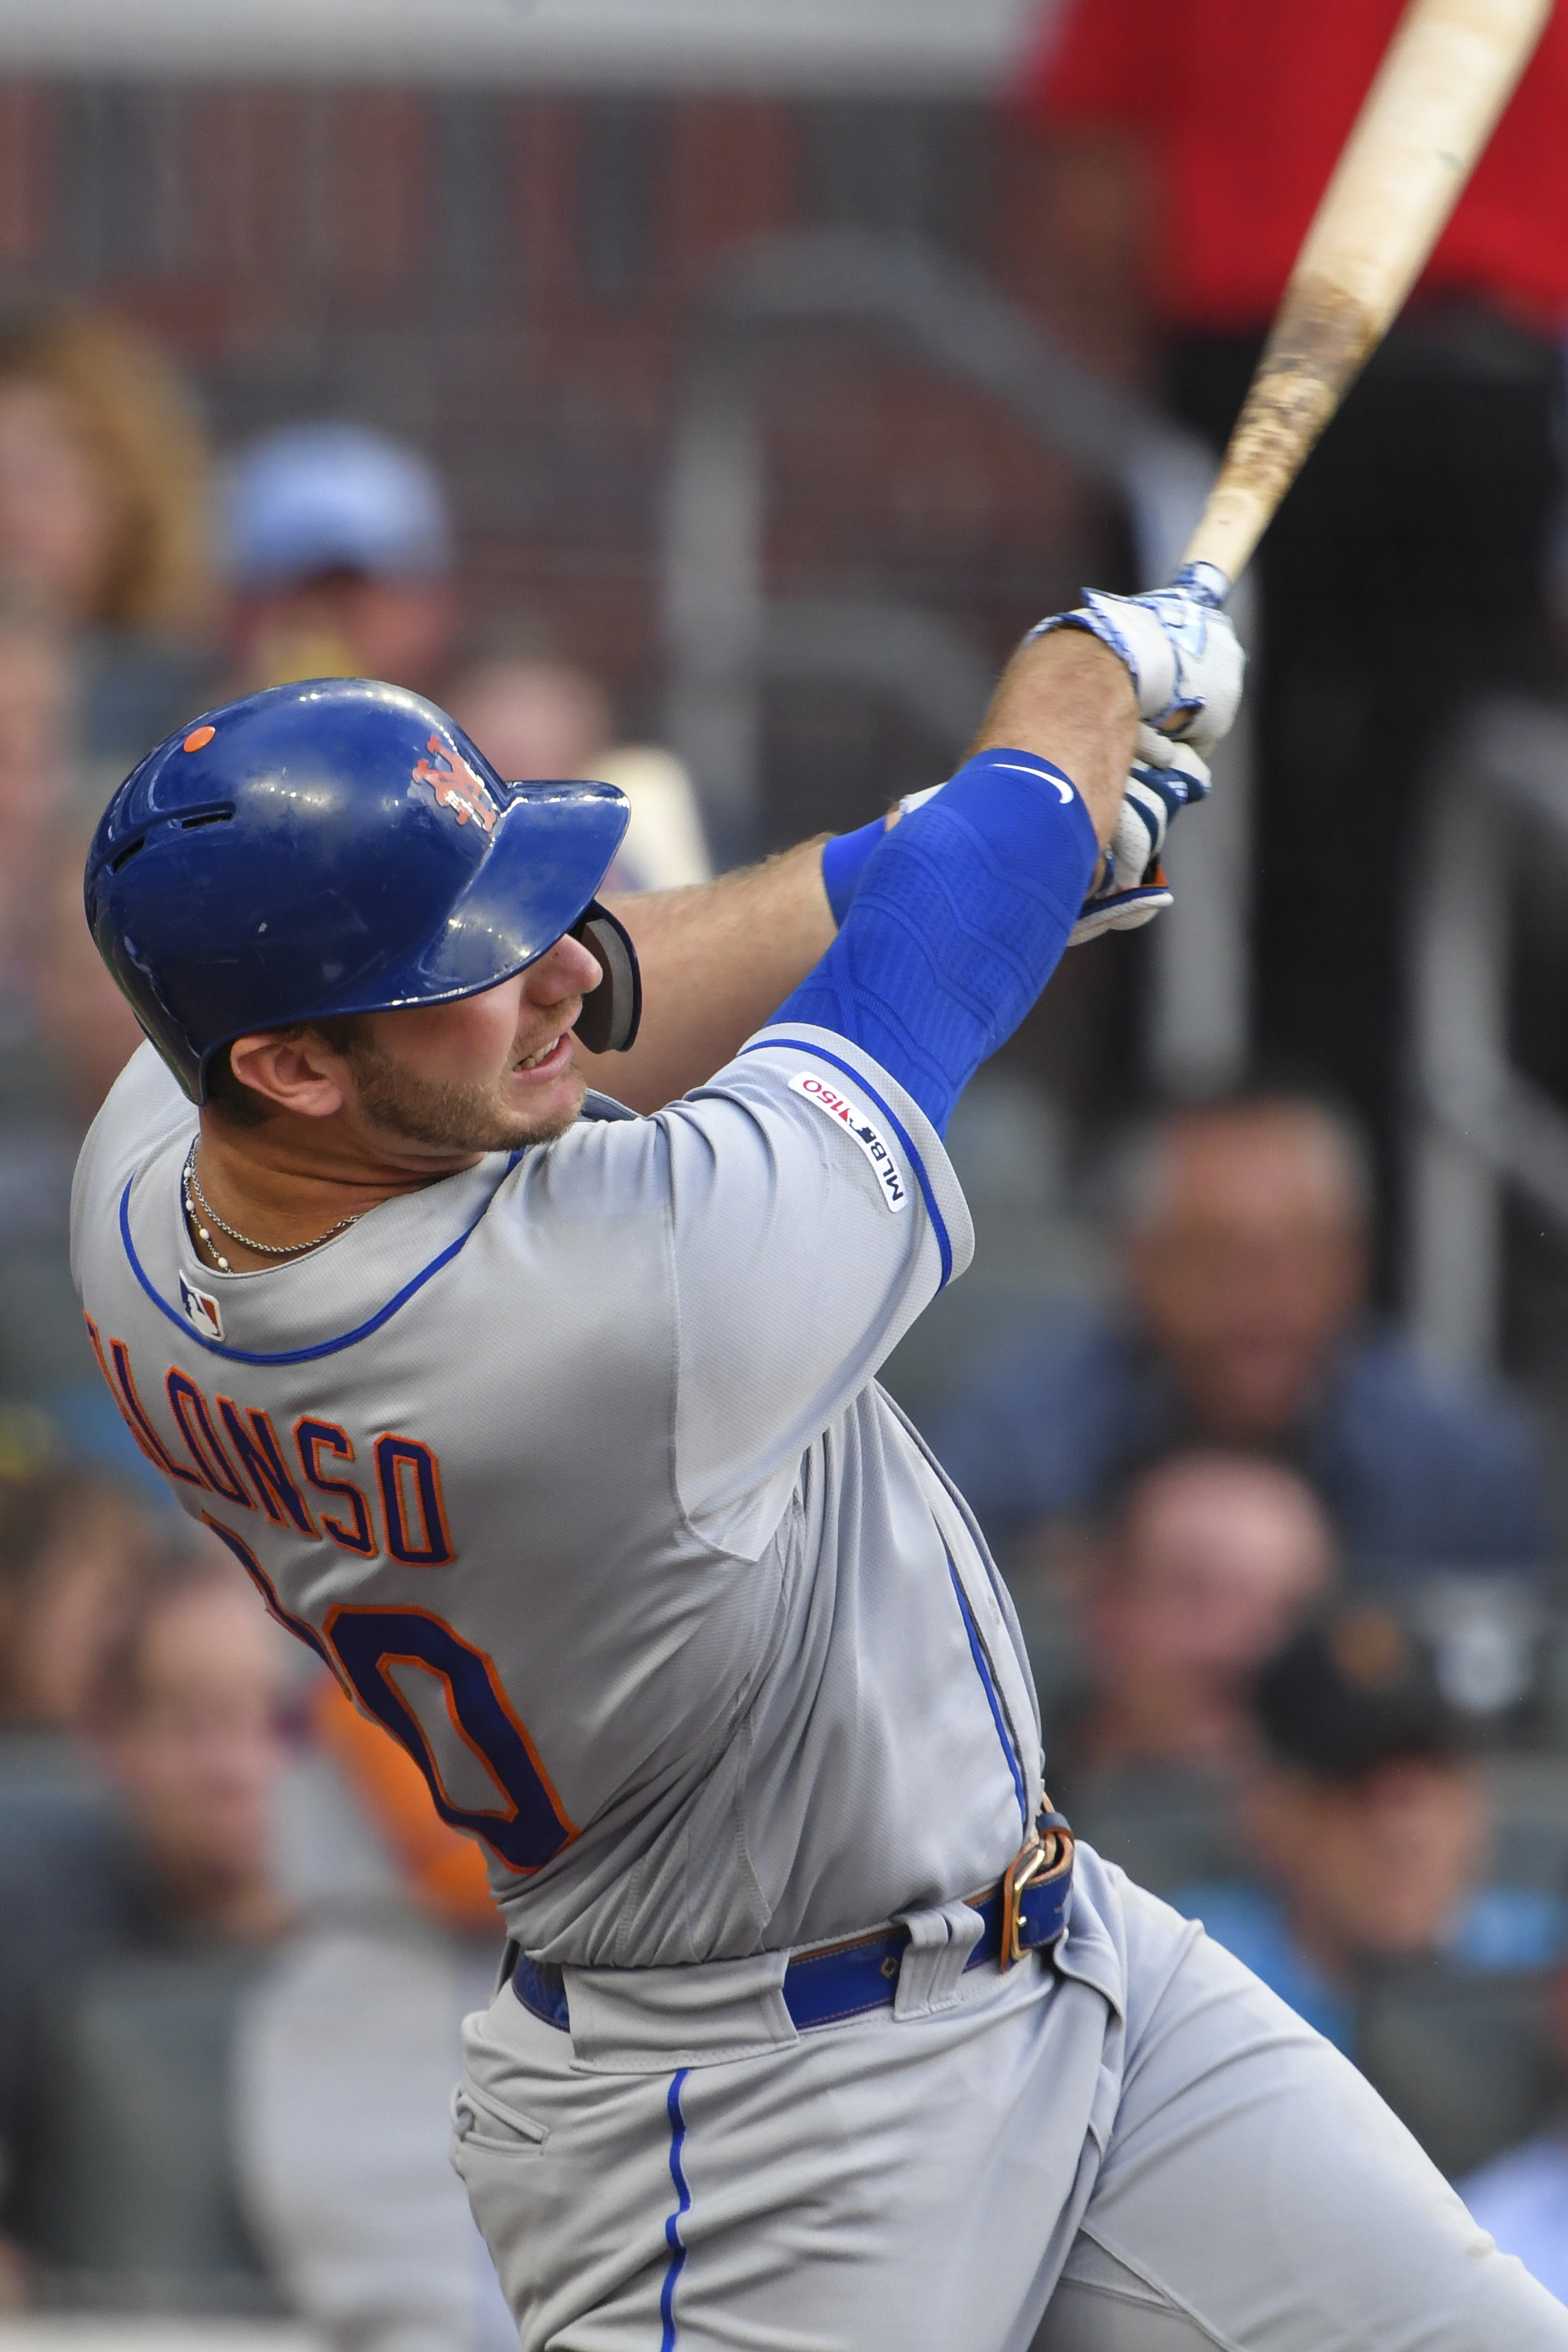 6/18/19 Game Preview: New York Mets at Atlanta Braves